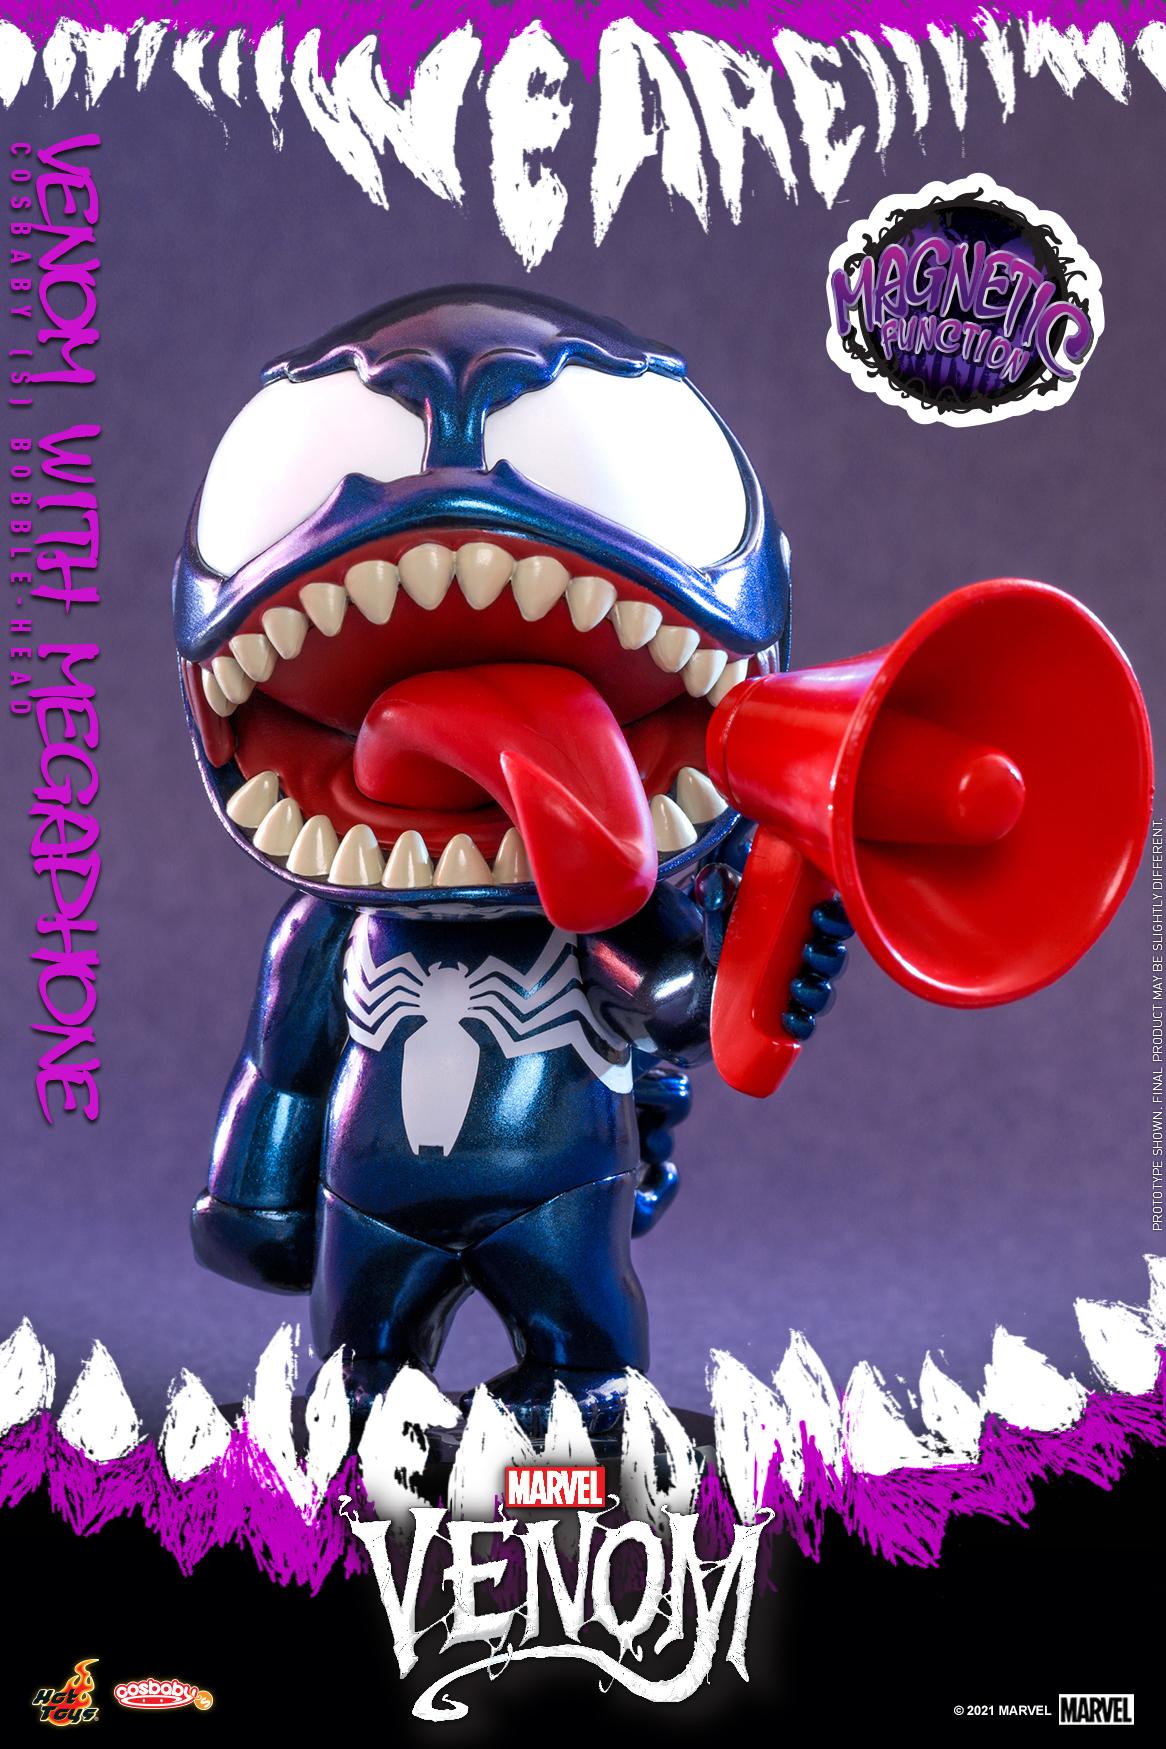 Hot Toys - Venom (Comic) - Venom with Megaphone Cosbaby_PR2